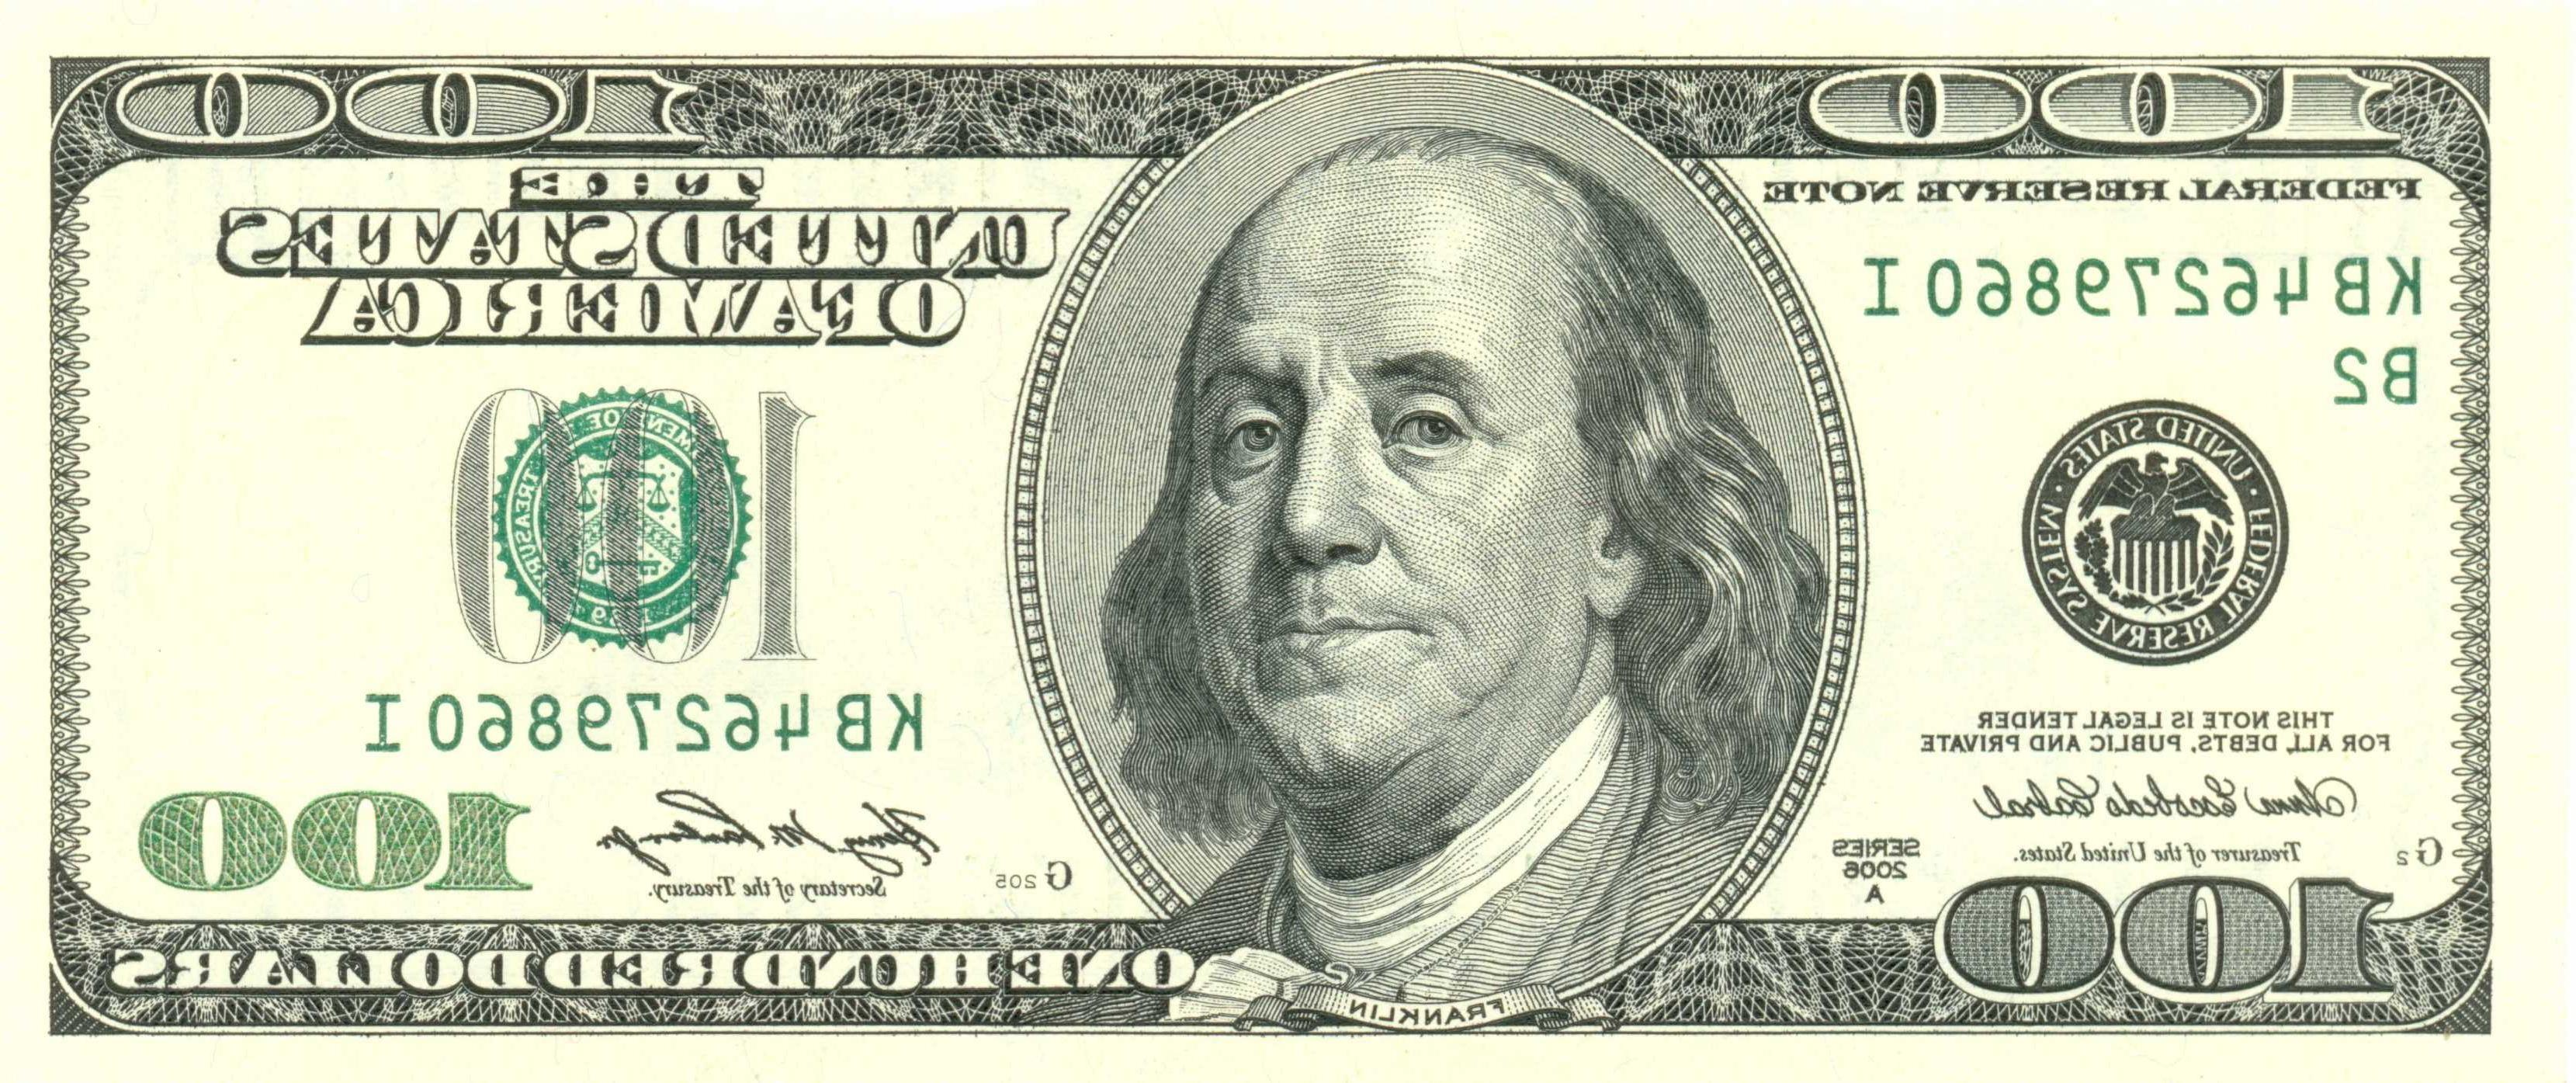 Best 100 Dollar Bill Printable Vector Pictures » Free Vector Art - Free Printable 100 Dollar Bill